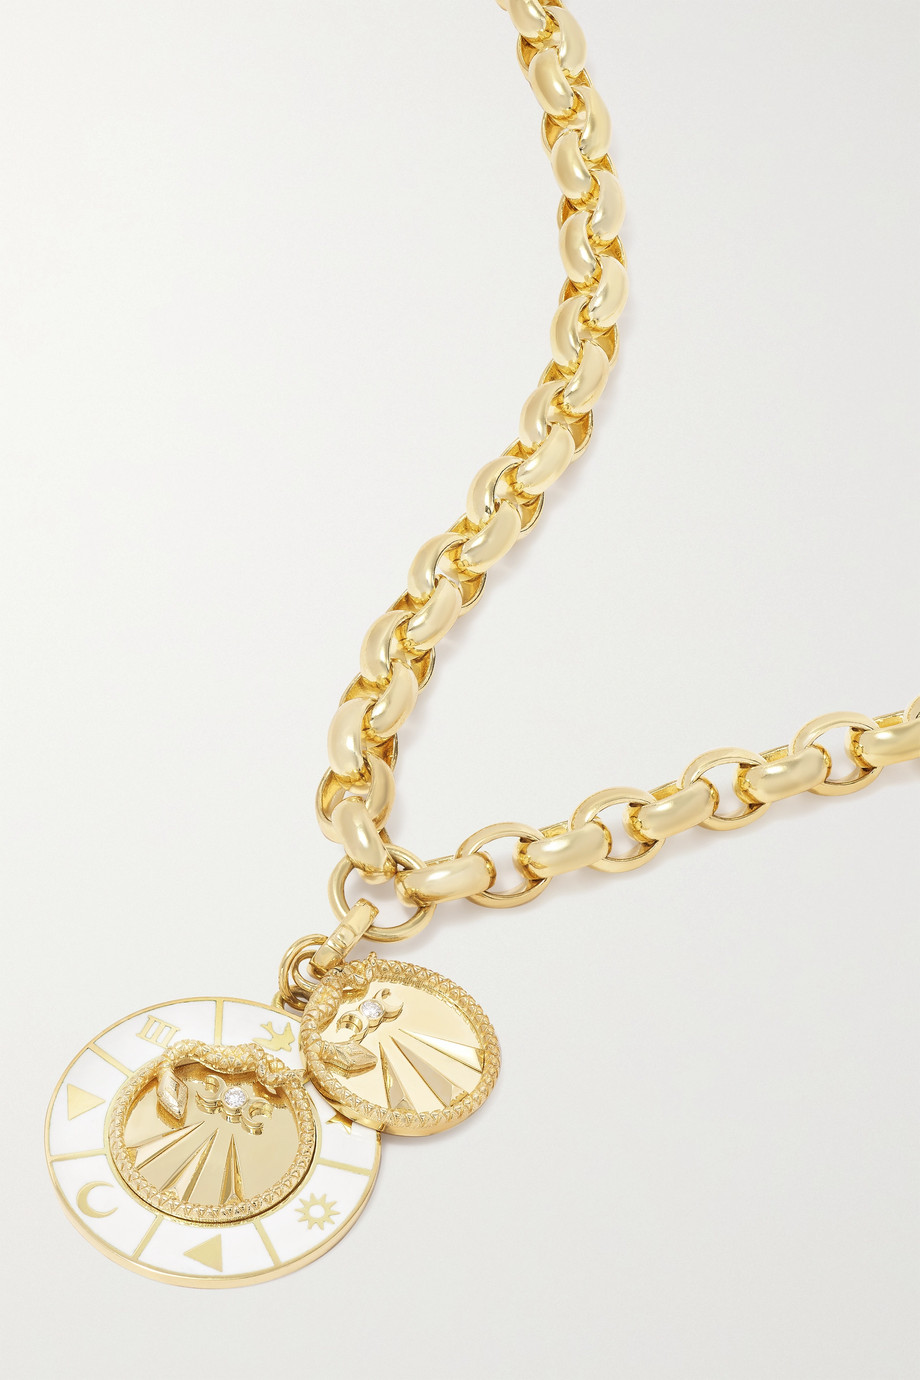 Foundrae Mind Body Soul and Wholeness 18-karat gold, enamel and diamond necklace